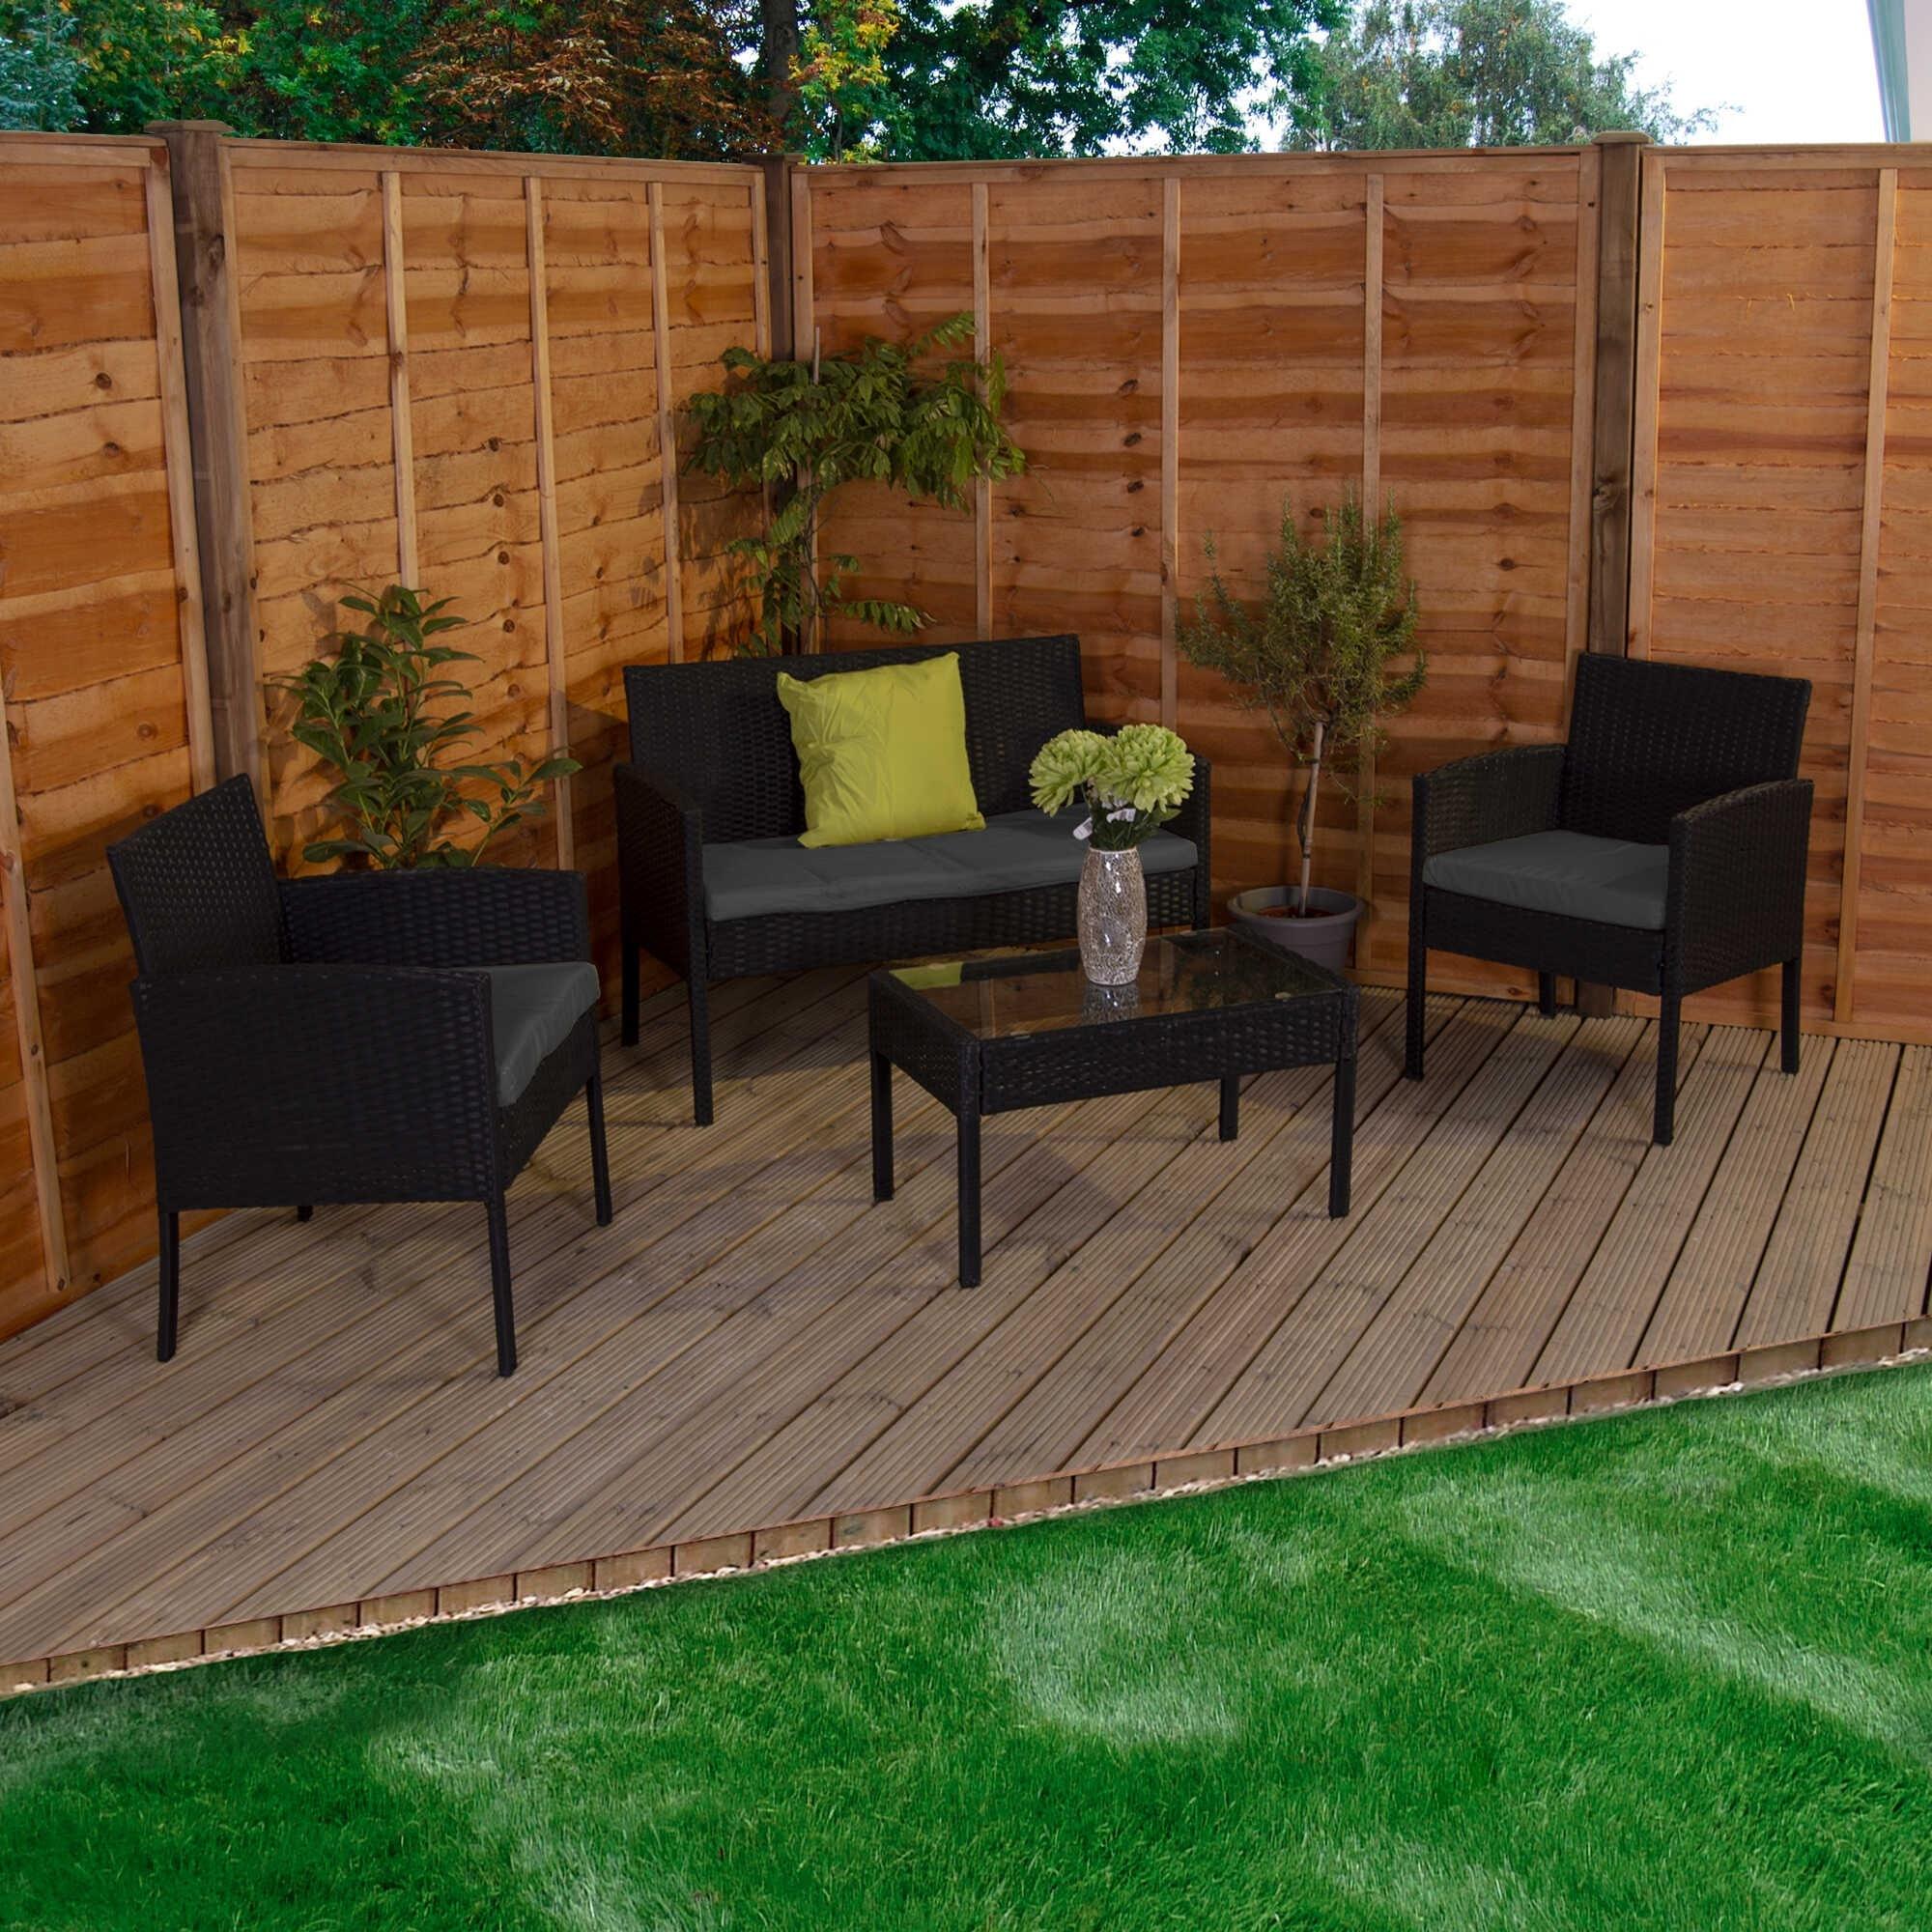 4 Seater Garden Set Grey Black Kendal Garden Furniture